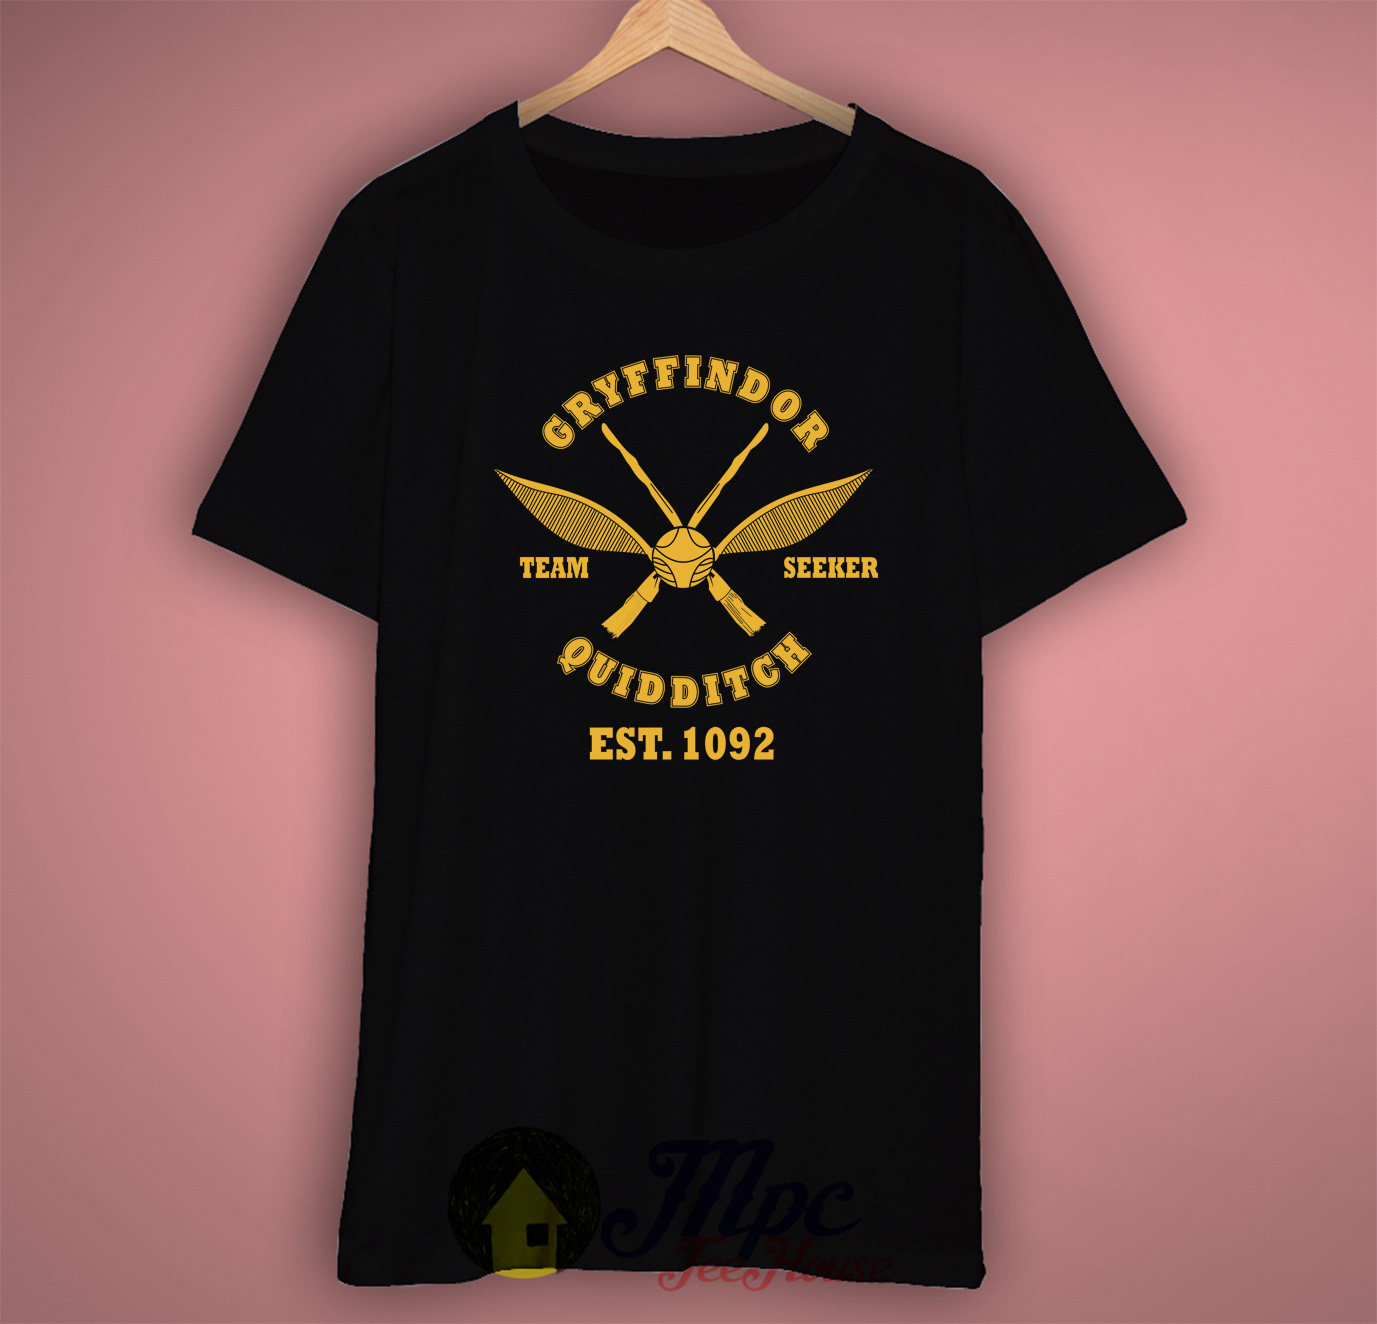 c650dd60f ... Clothing, Home Decor, Men, Popular, Uncategorized, Women. Harry Potter  Gryffindor Quidditch T Shirt